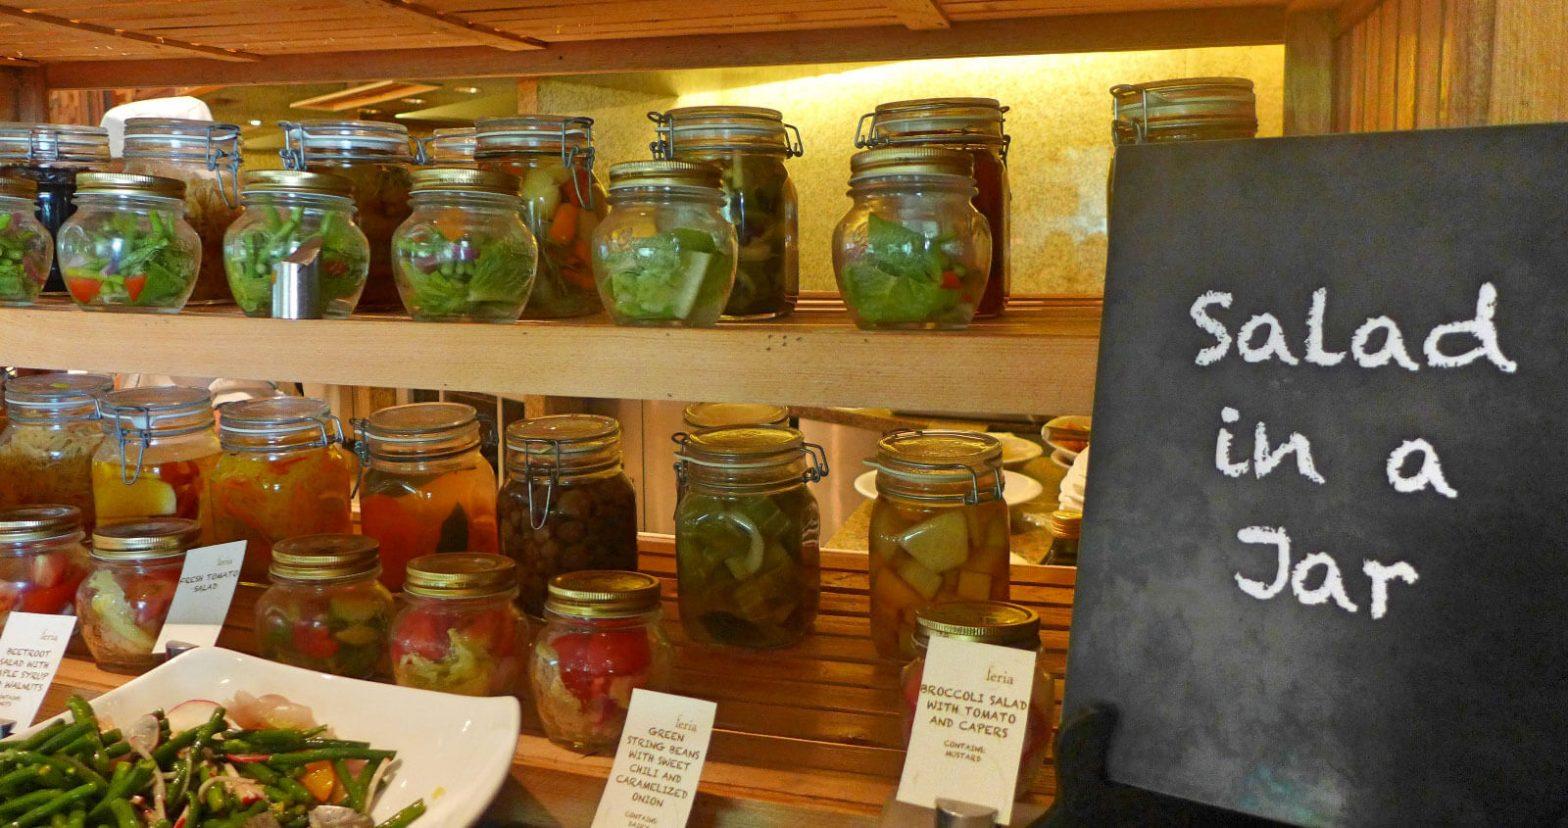 Radisson Blu Cebu Feria buffet salad in a jar